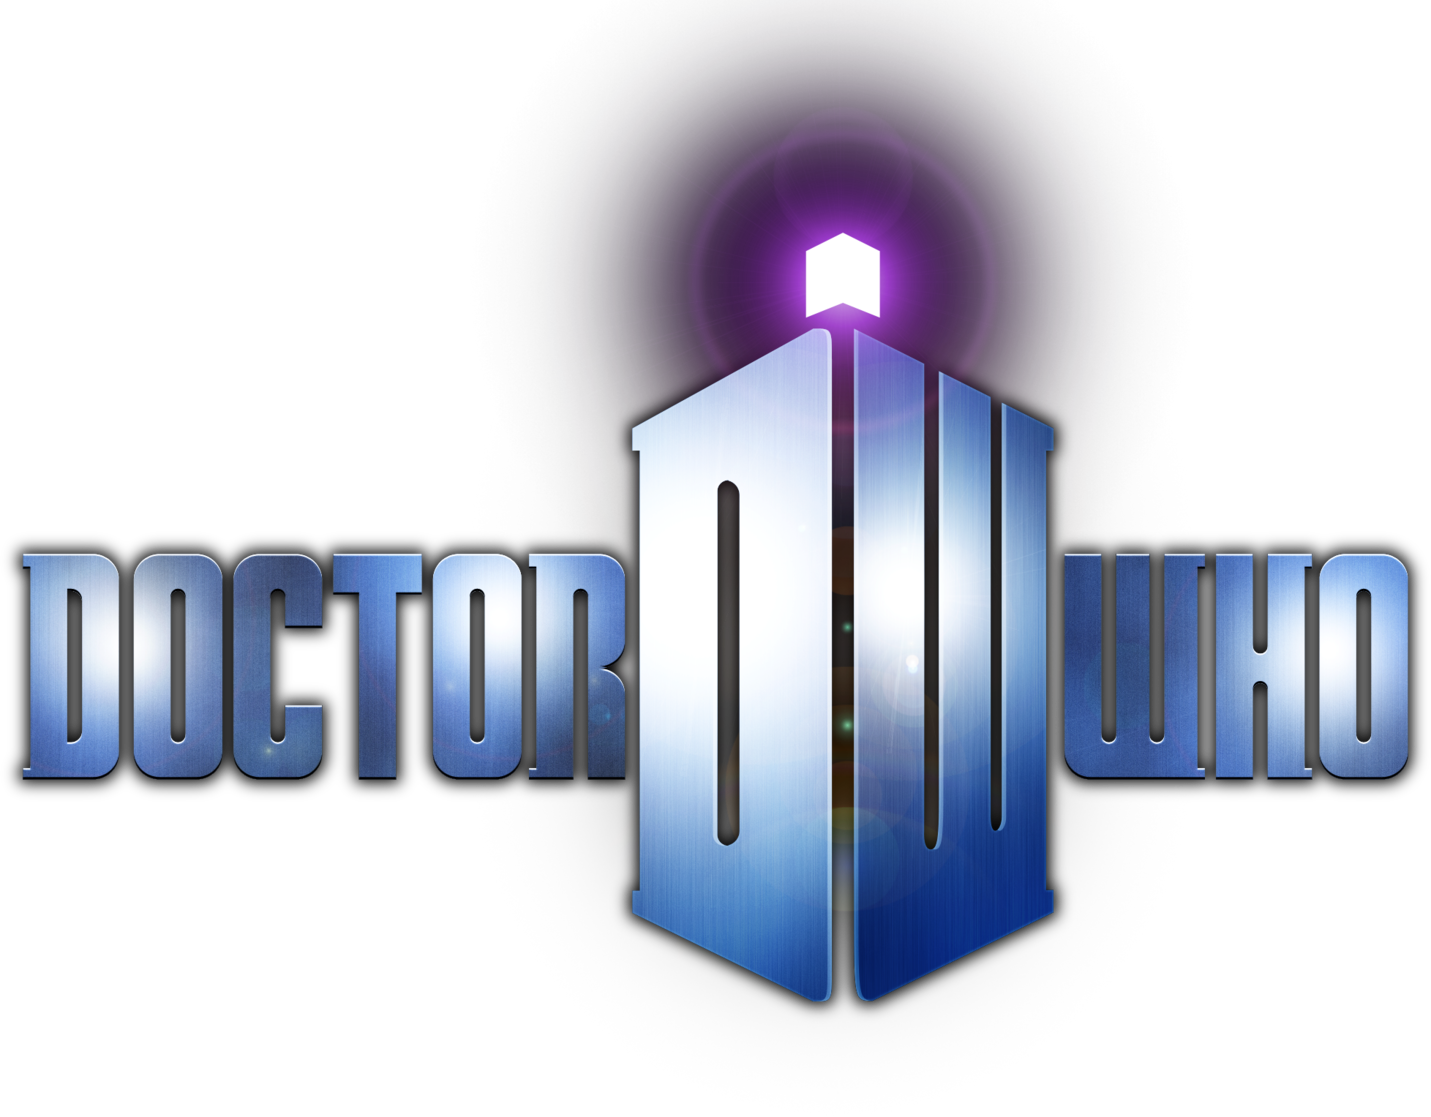 Dw logo clipart png transparent download Doctor Who Dw Logo Png Images png transparent download